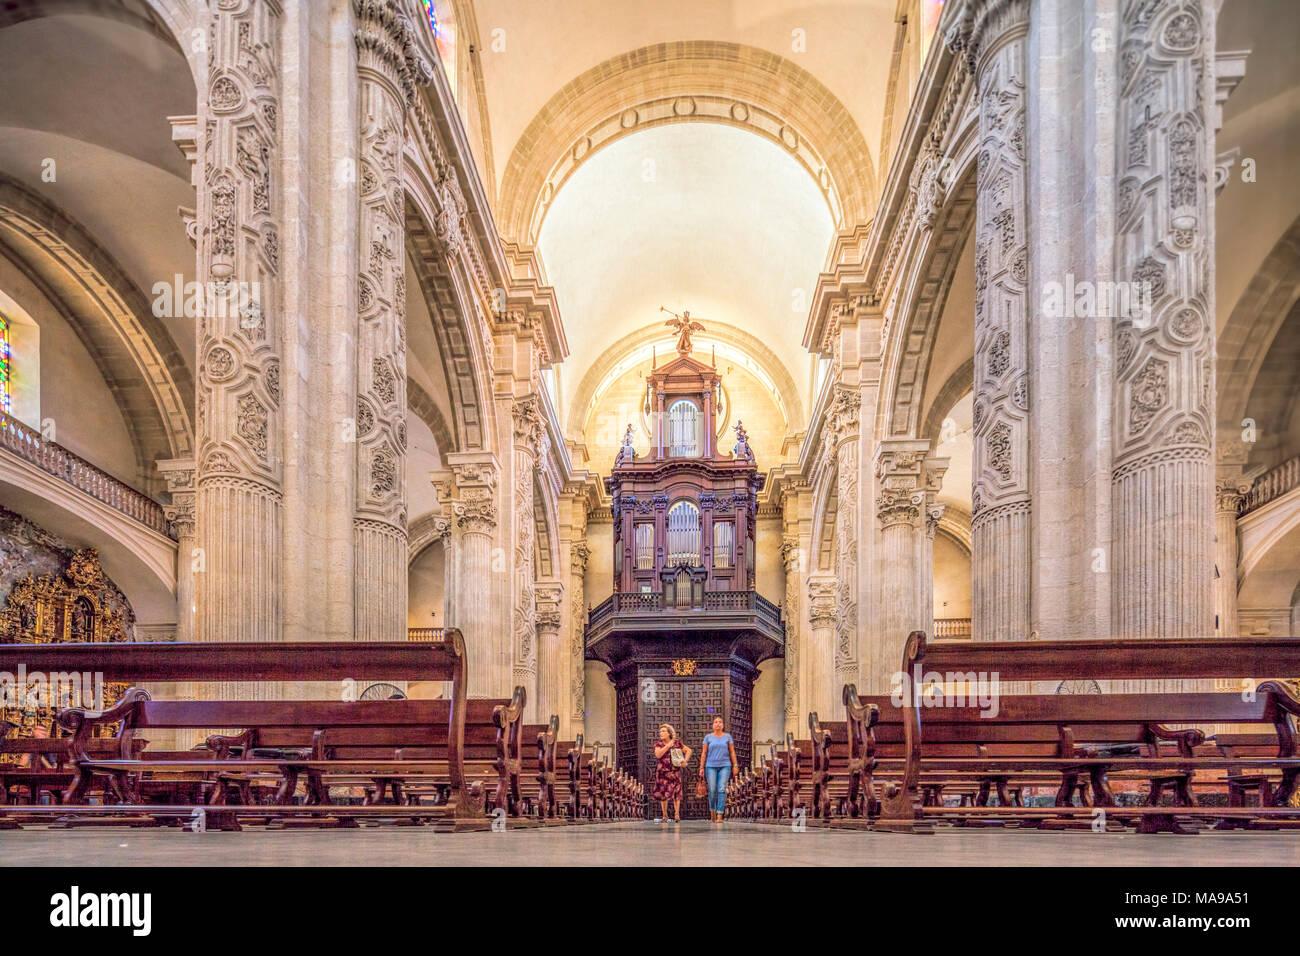 Interior de la iglesia Imagen De Stock